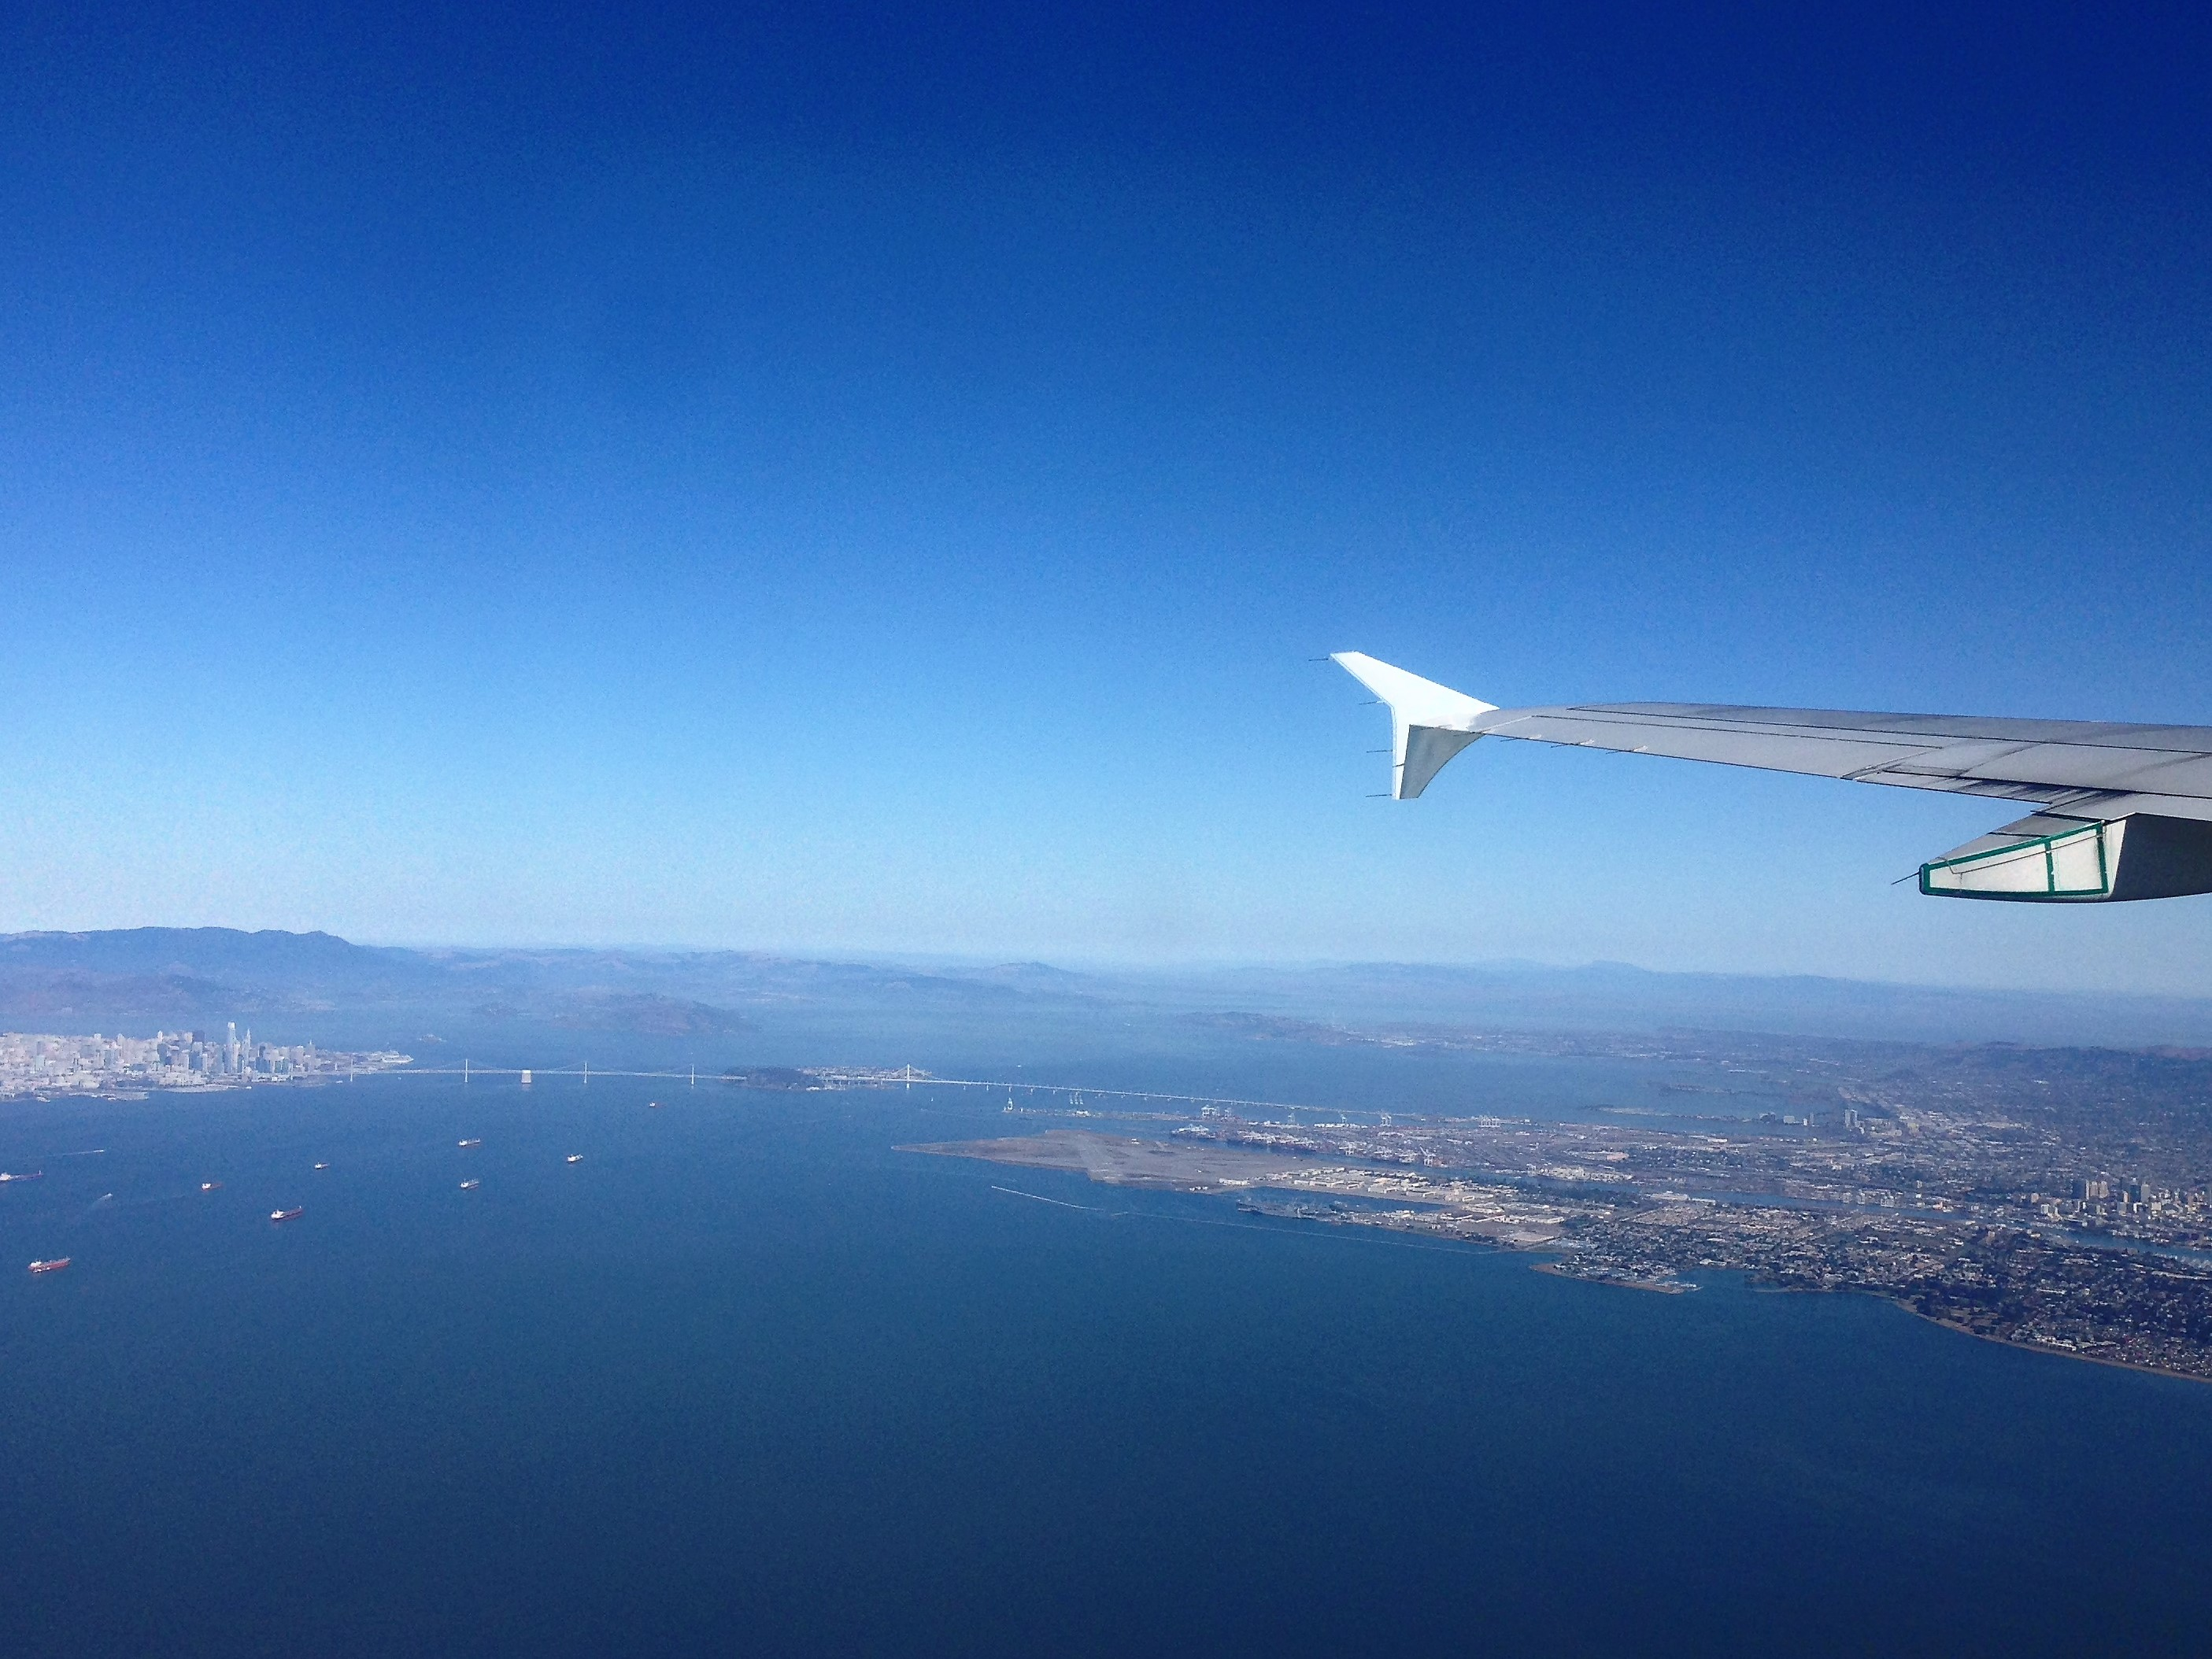 Air canada - California - Alida Travel